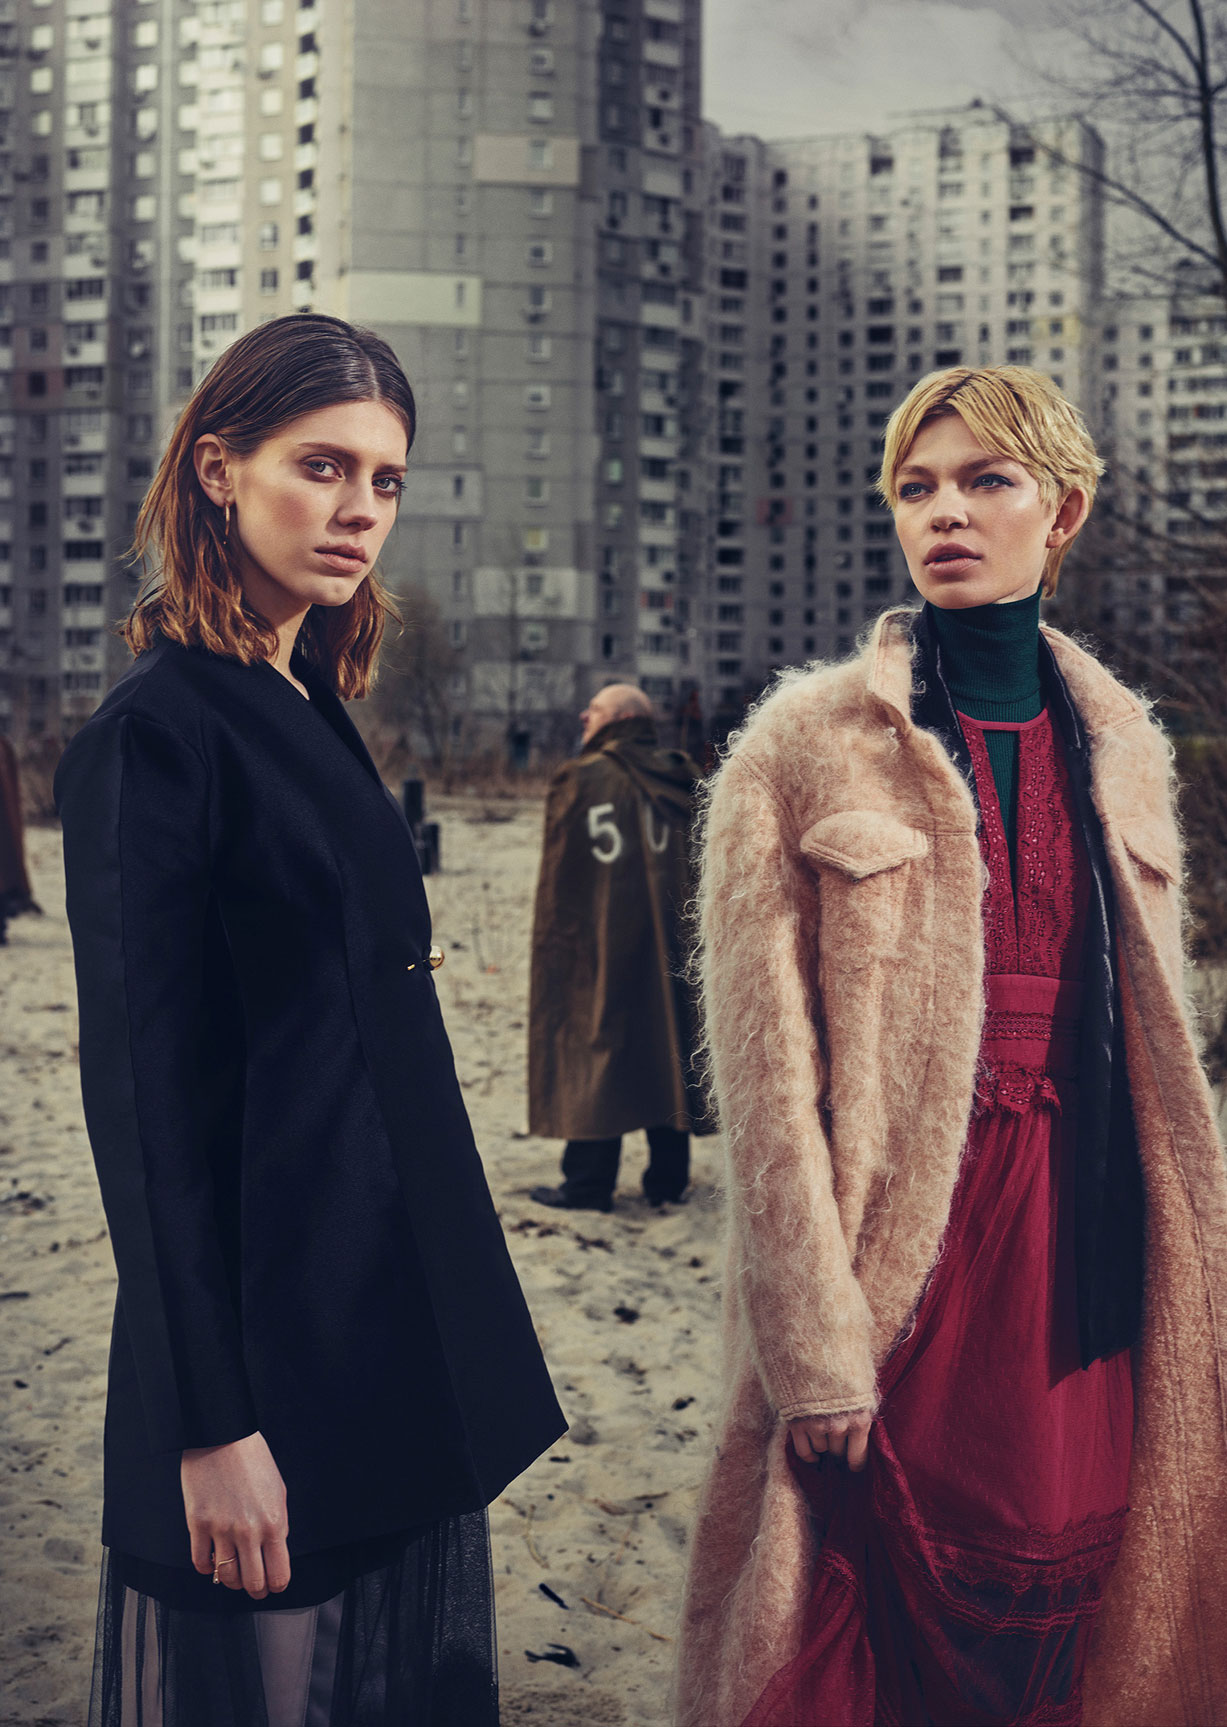 Sasha Popruga and Oxana Zubko by Crowns and Owls / Schon! Magazine